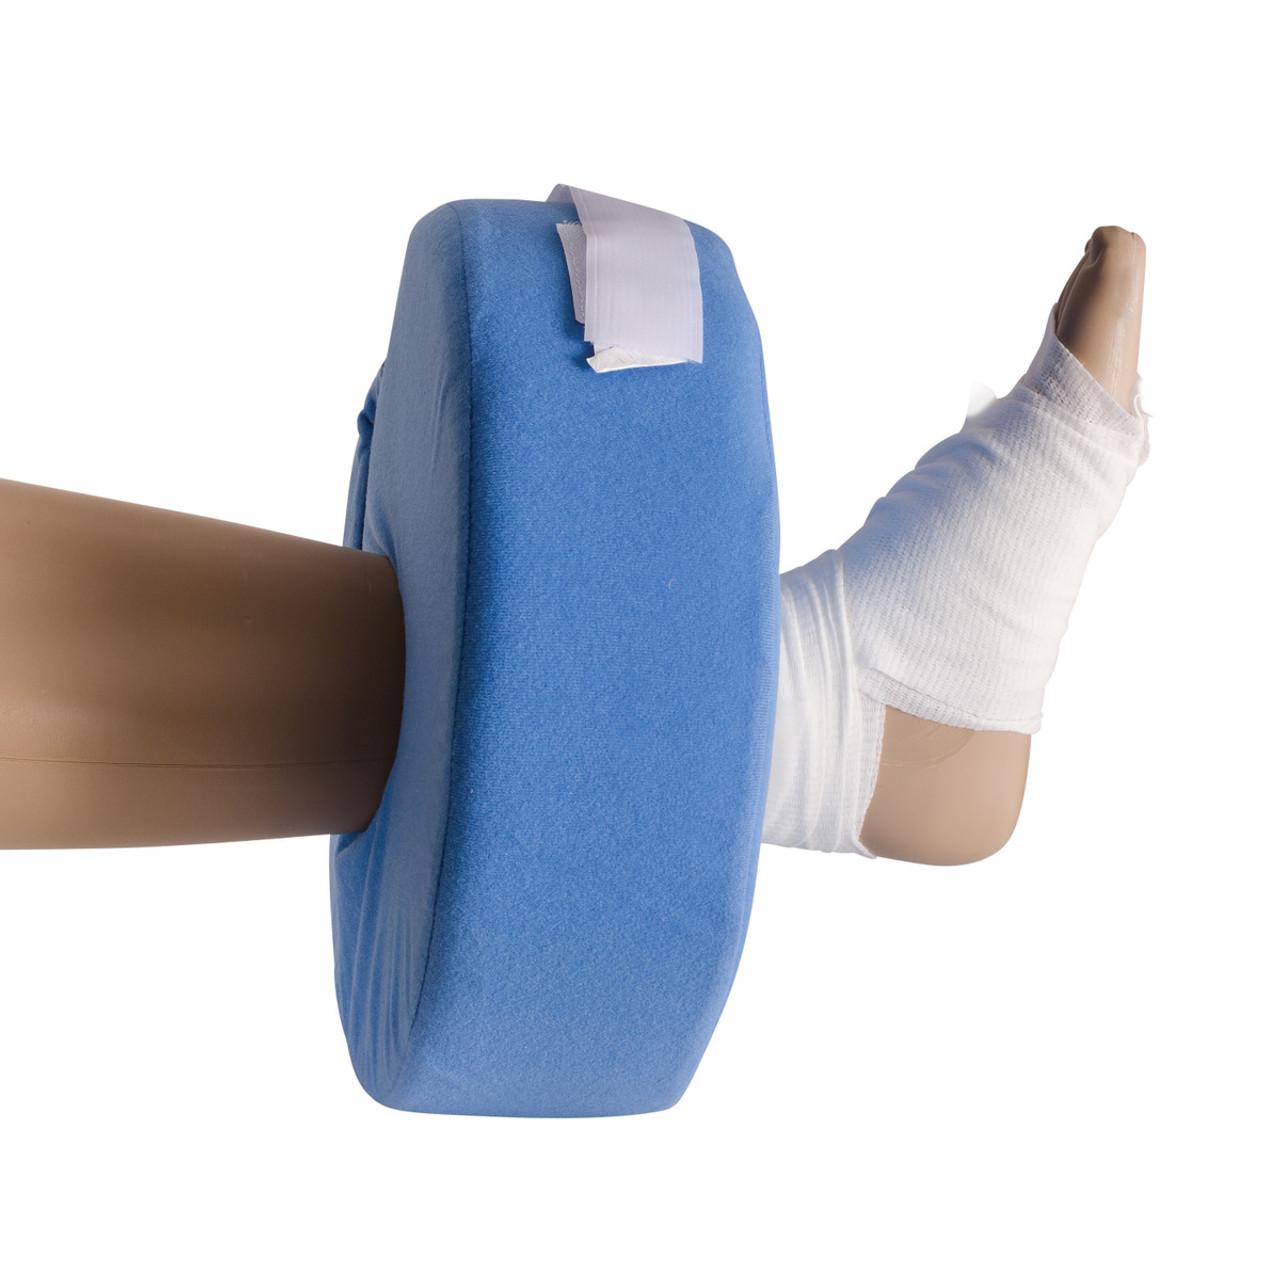 DMI® Contour Foot Elevator Foam Leg Rest Cushion Pillow, by Healthsmart